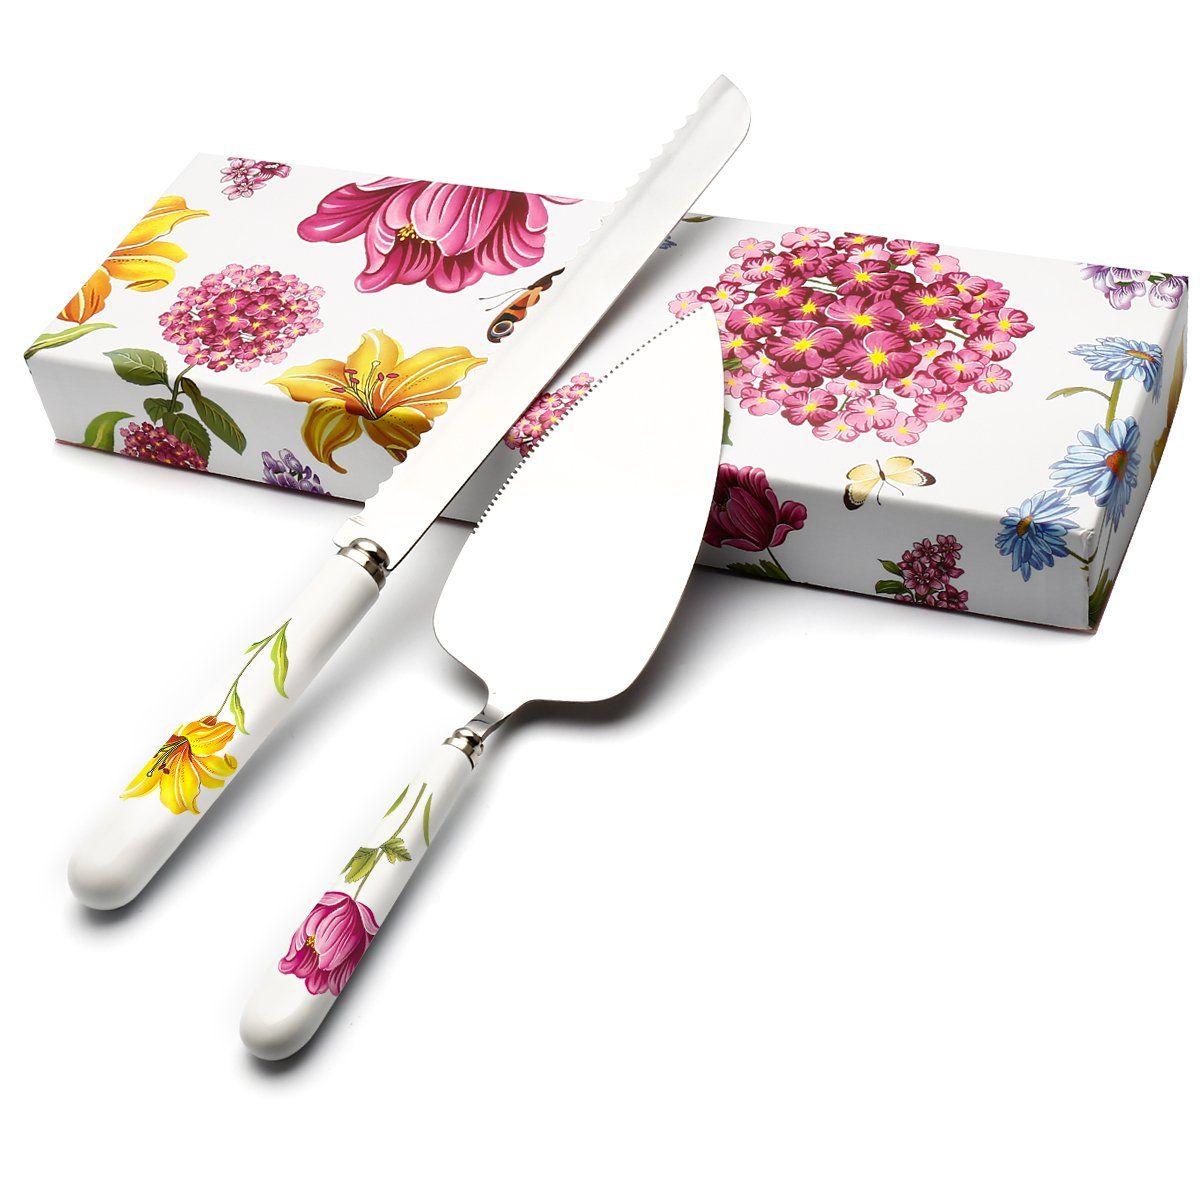 Hobo 2piece wedding cake knife and server set herb garden